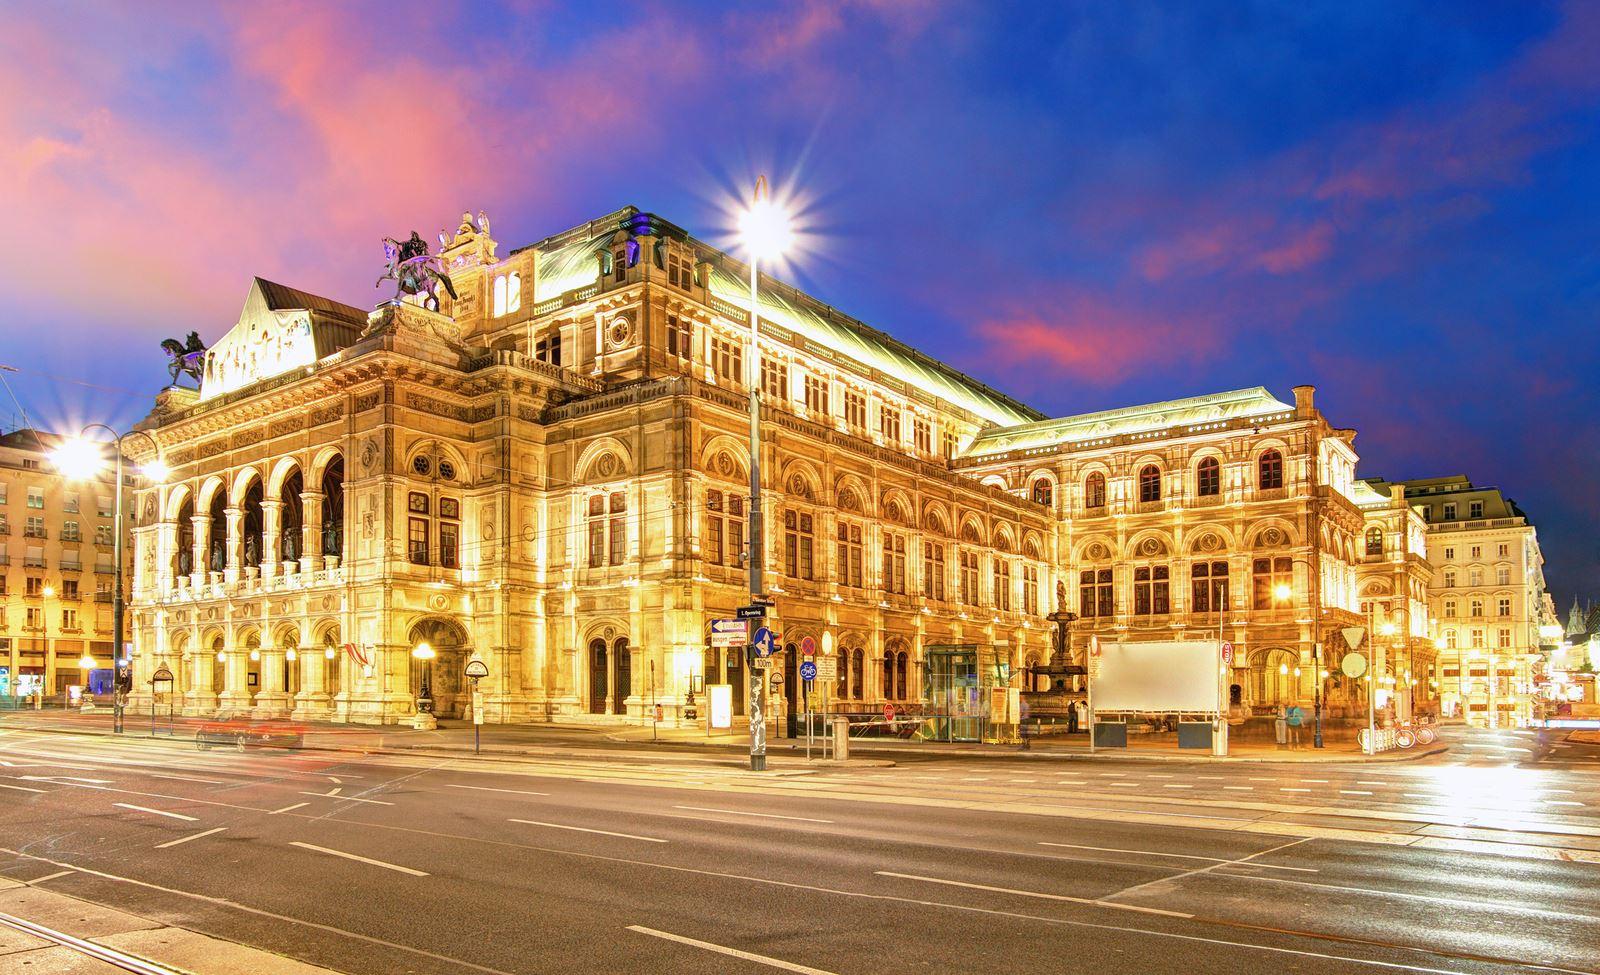 Vienna hotels fodor s - Vienna Hotels Fodor S 55